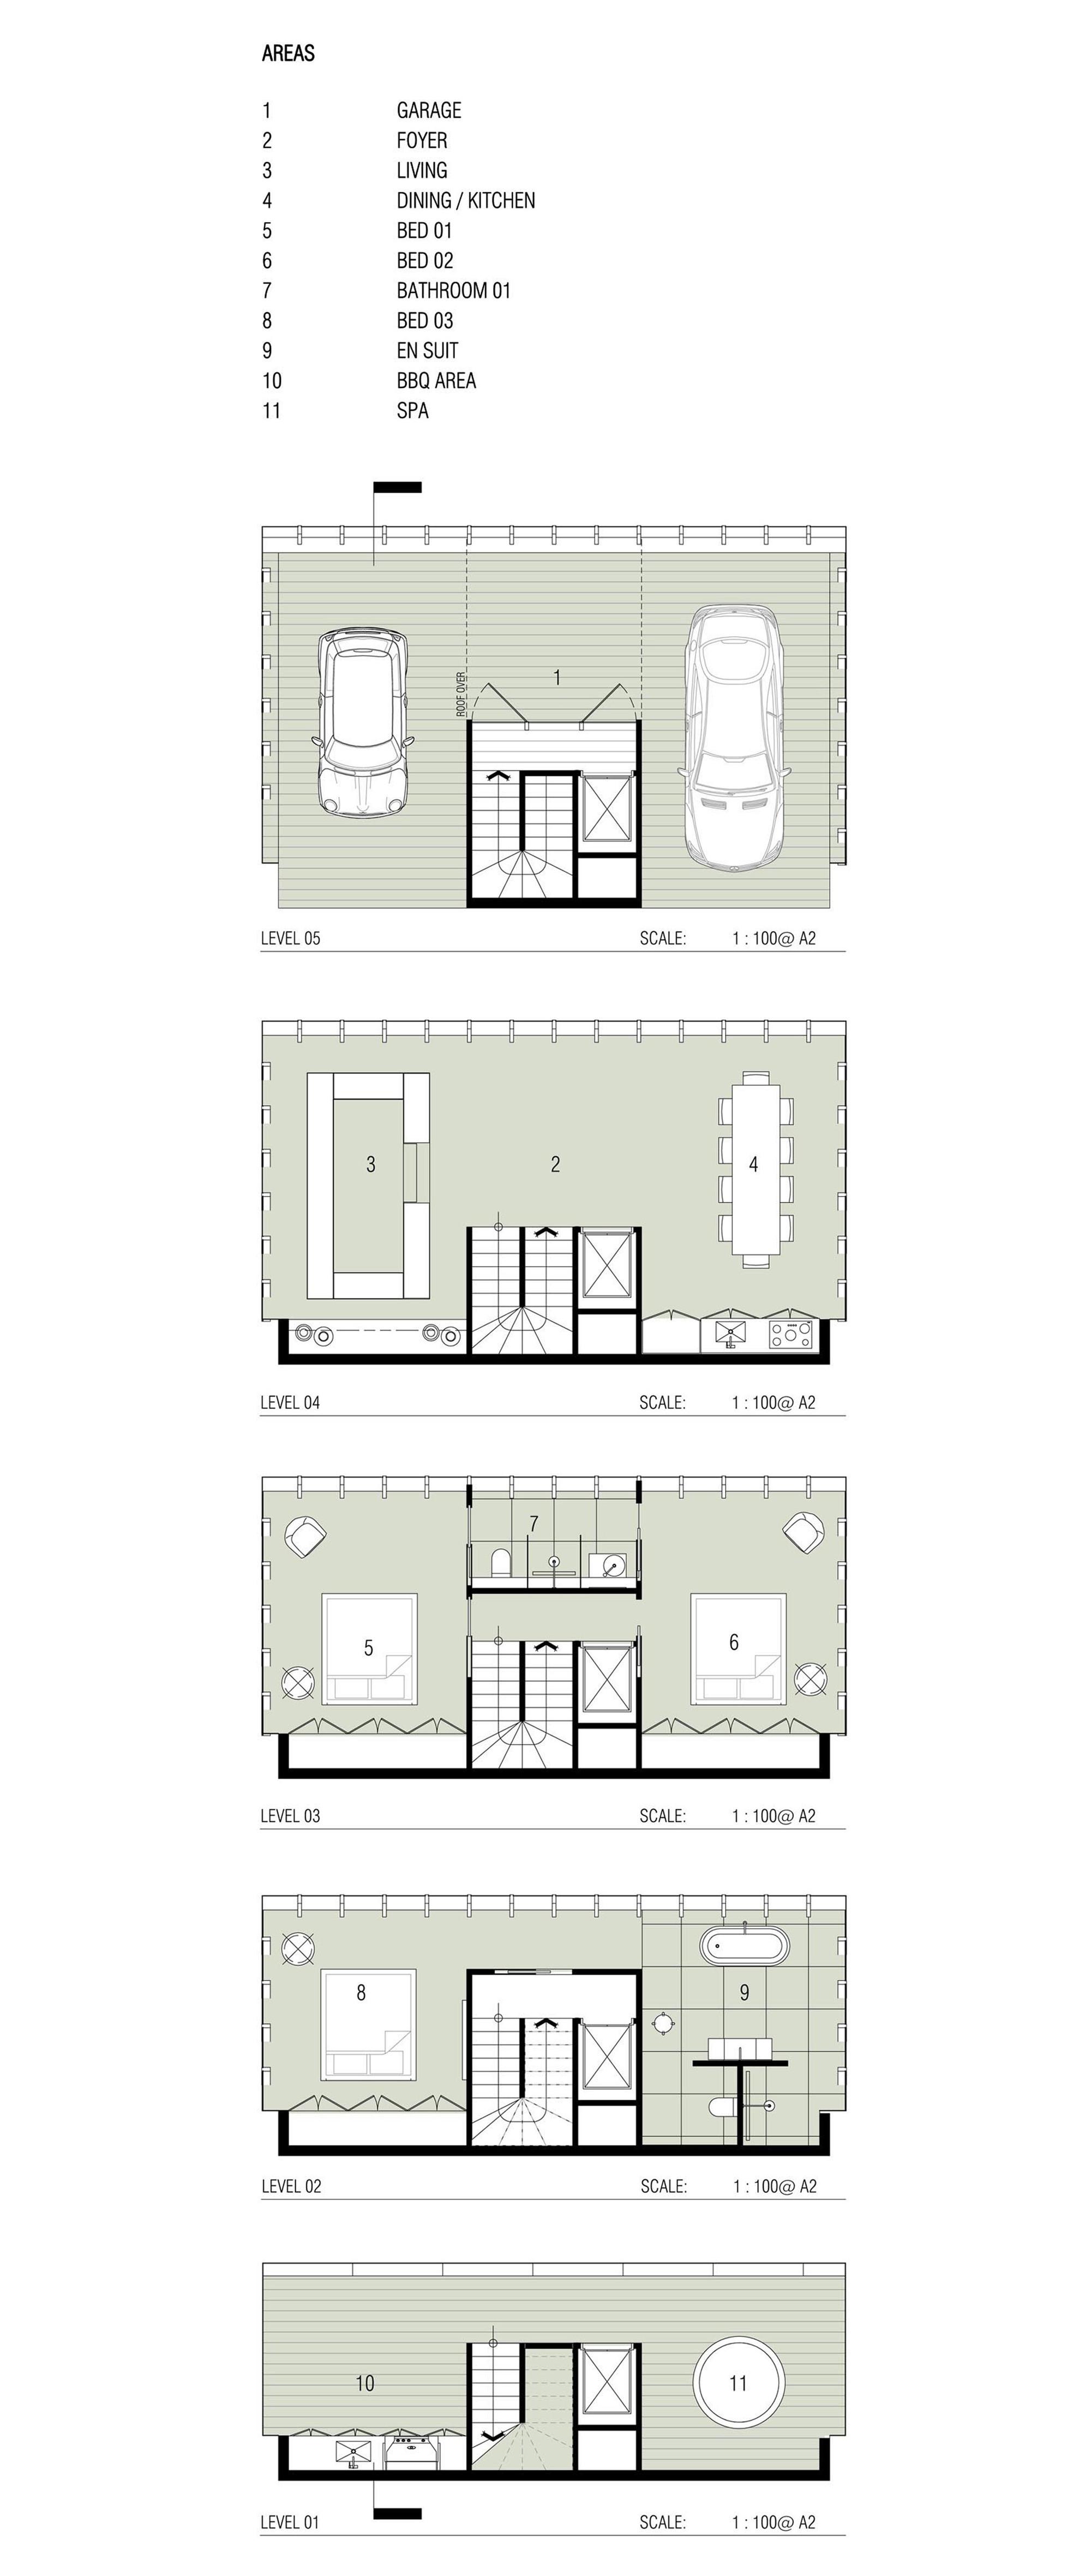 53fd5abfc07a800962000900_building-of-construction-engineering-disciplinary-organization-dayastudio-nextoffice_42